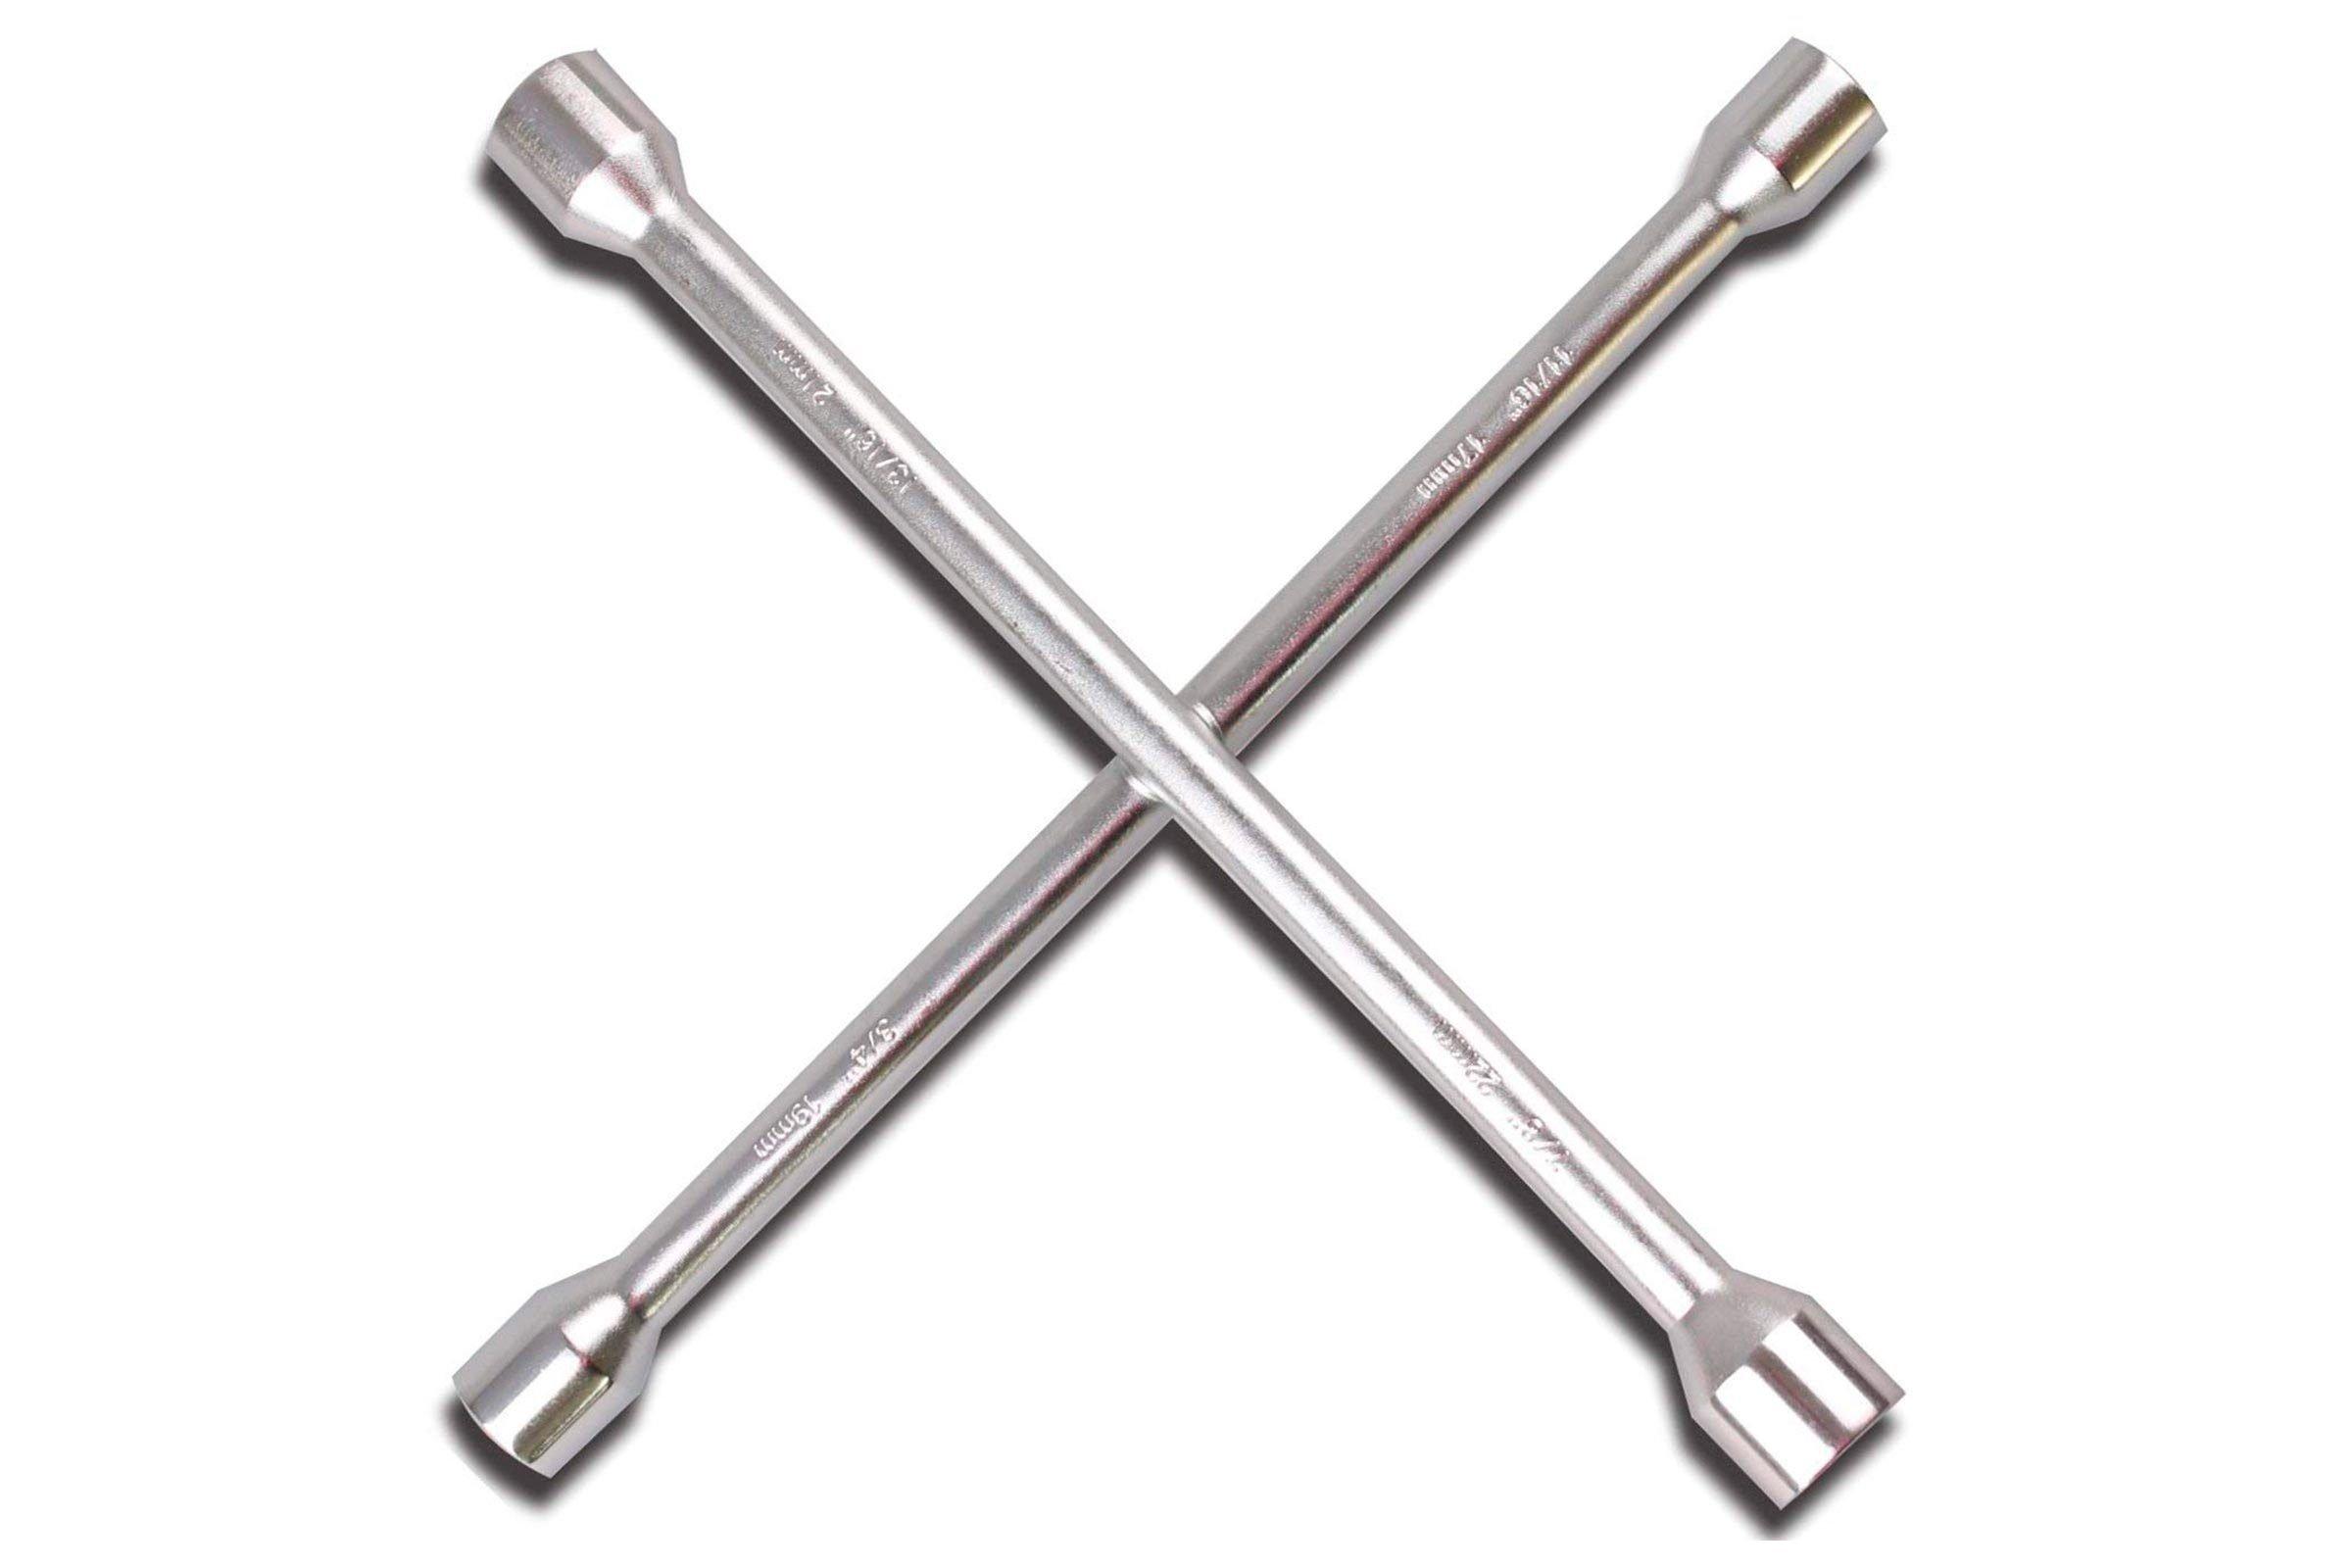 Lug wrench